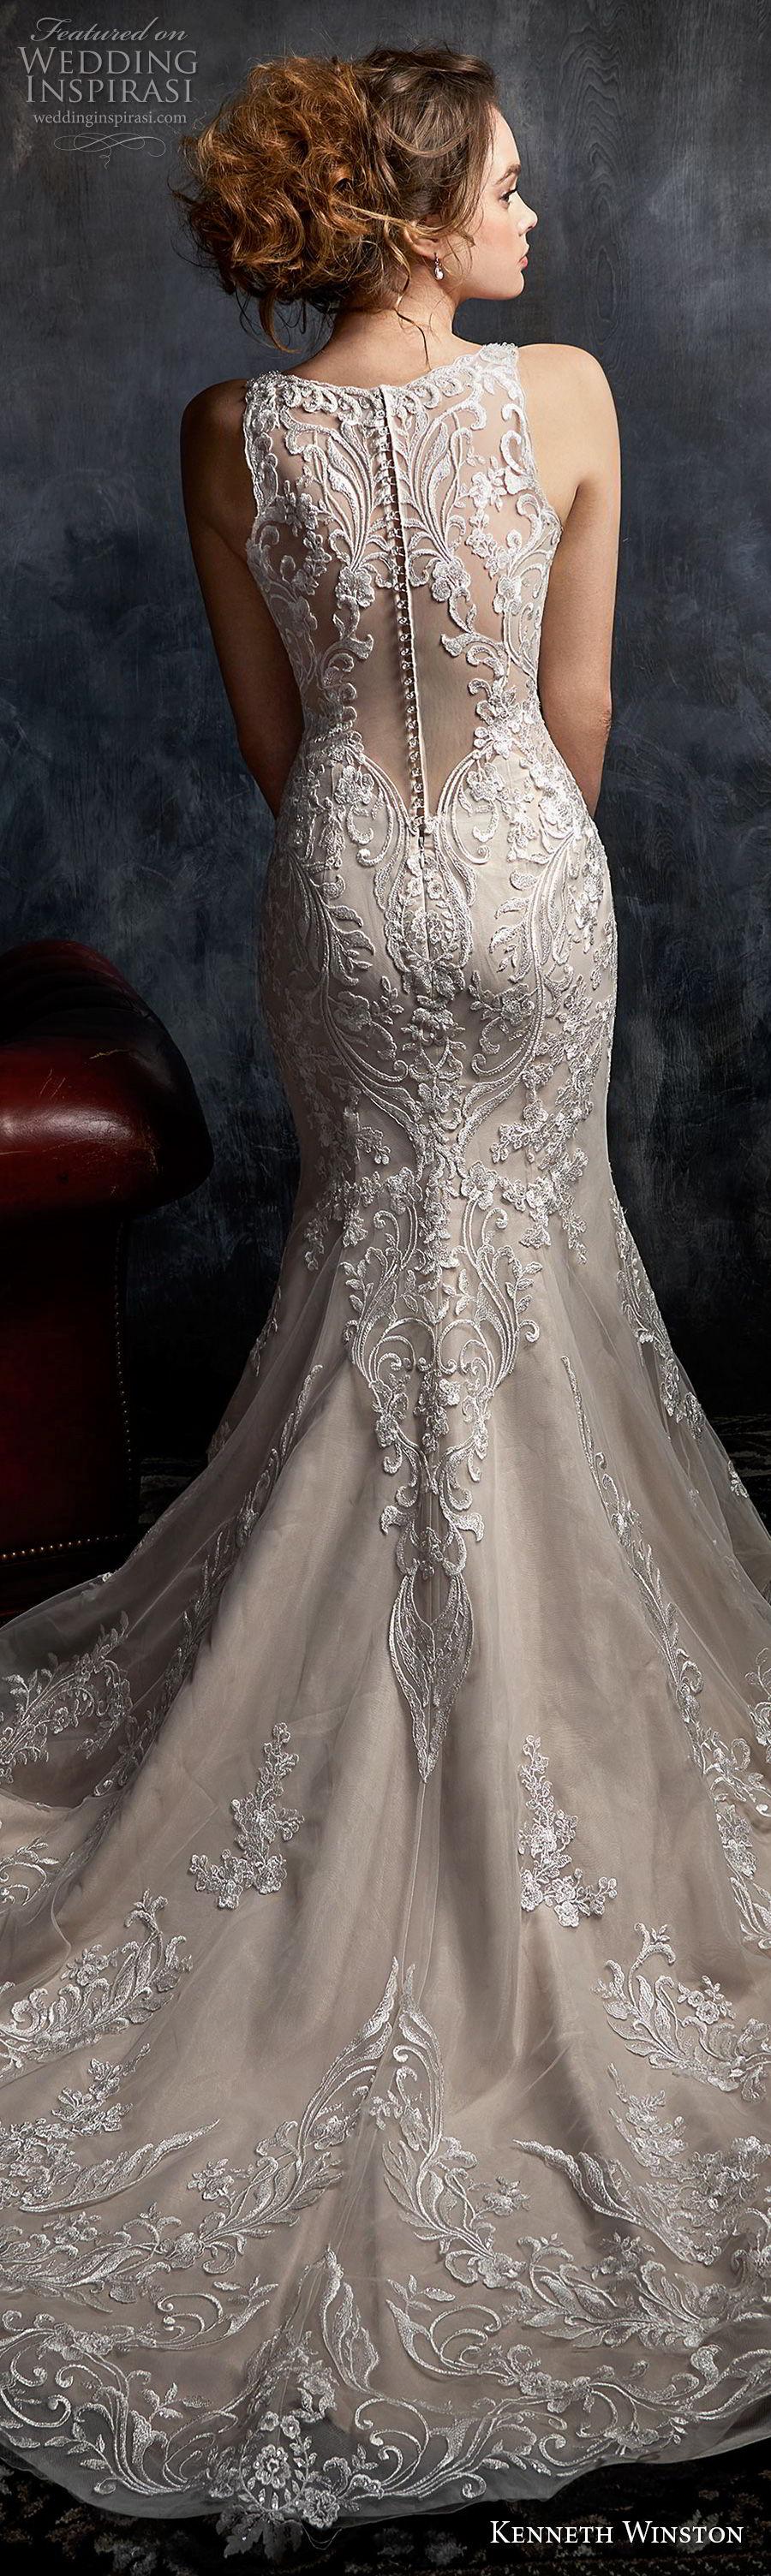 kenneth winston fall 2017 bridal sleeveless strap v neck full embellishement elegant fit and flare mermaid wedding dress covered lace back chapel train (37) lbv